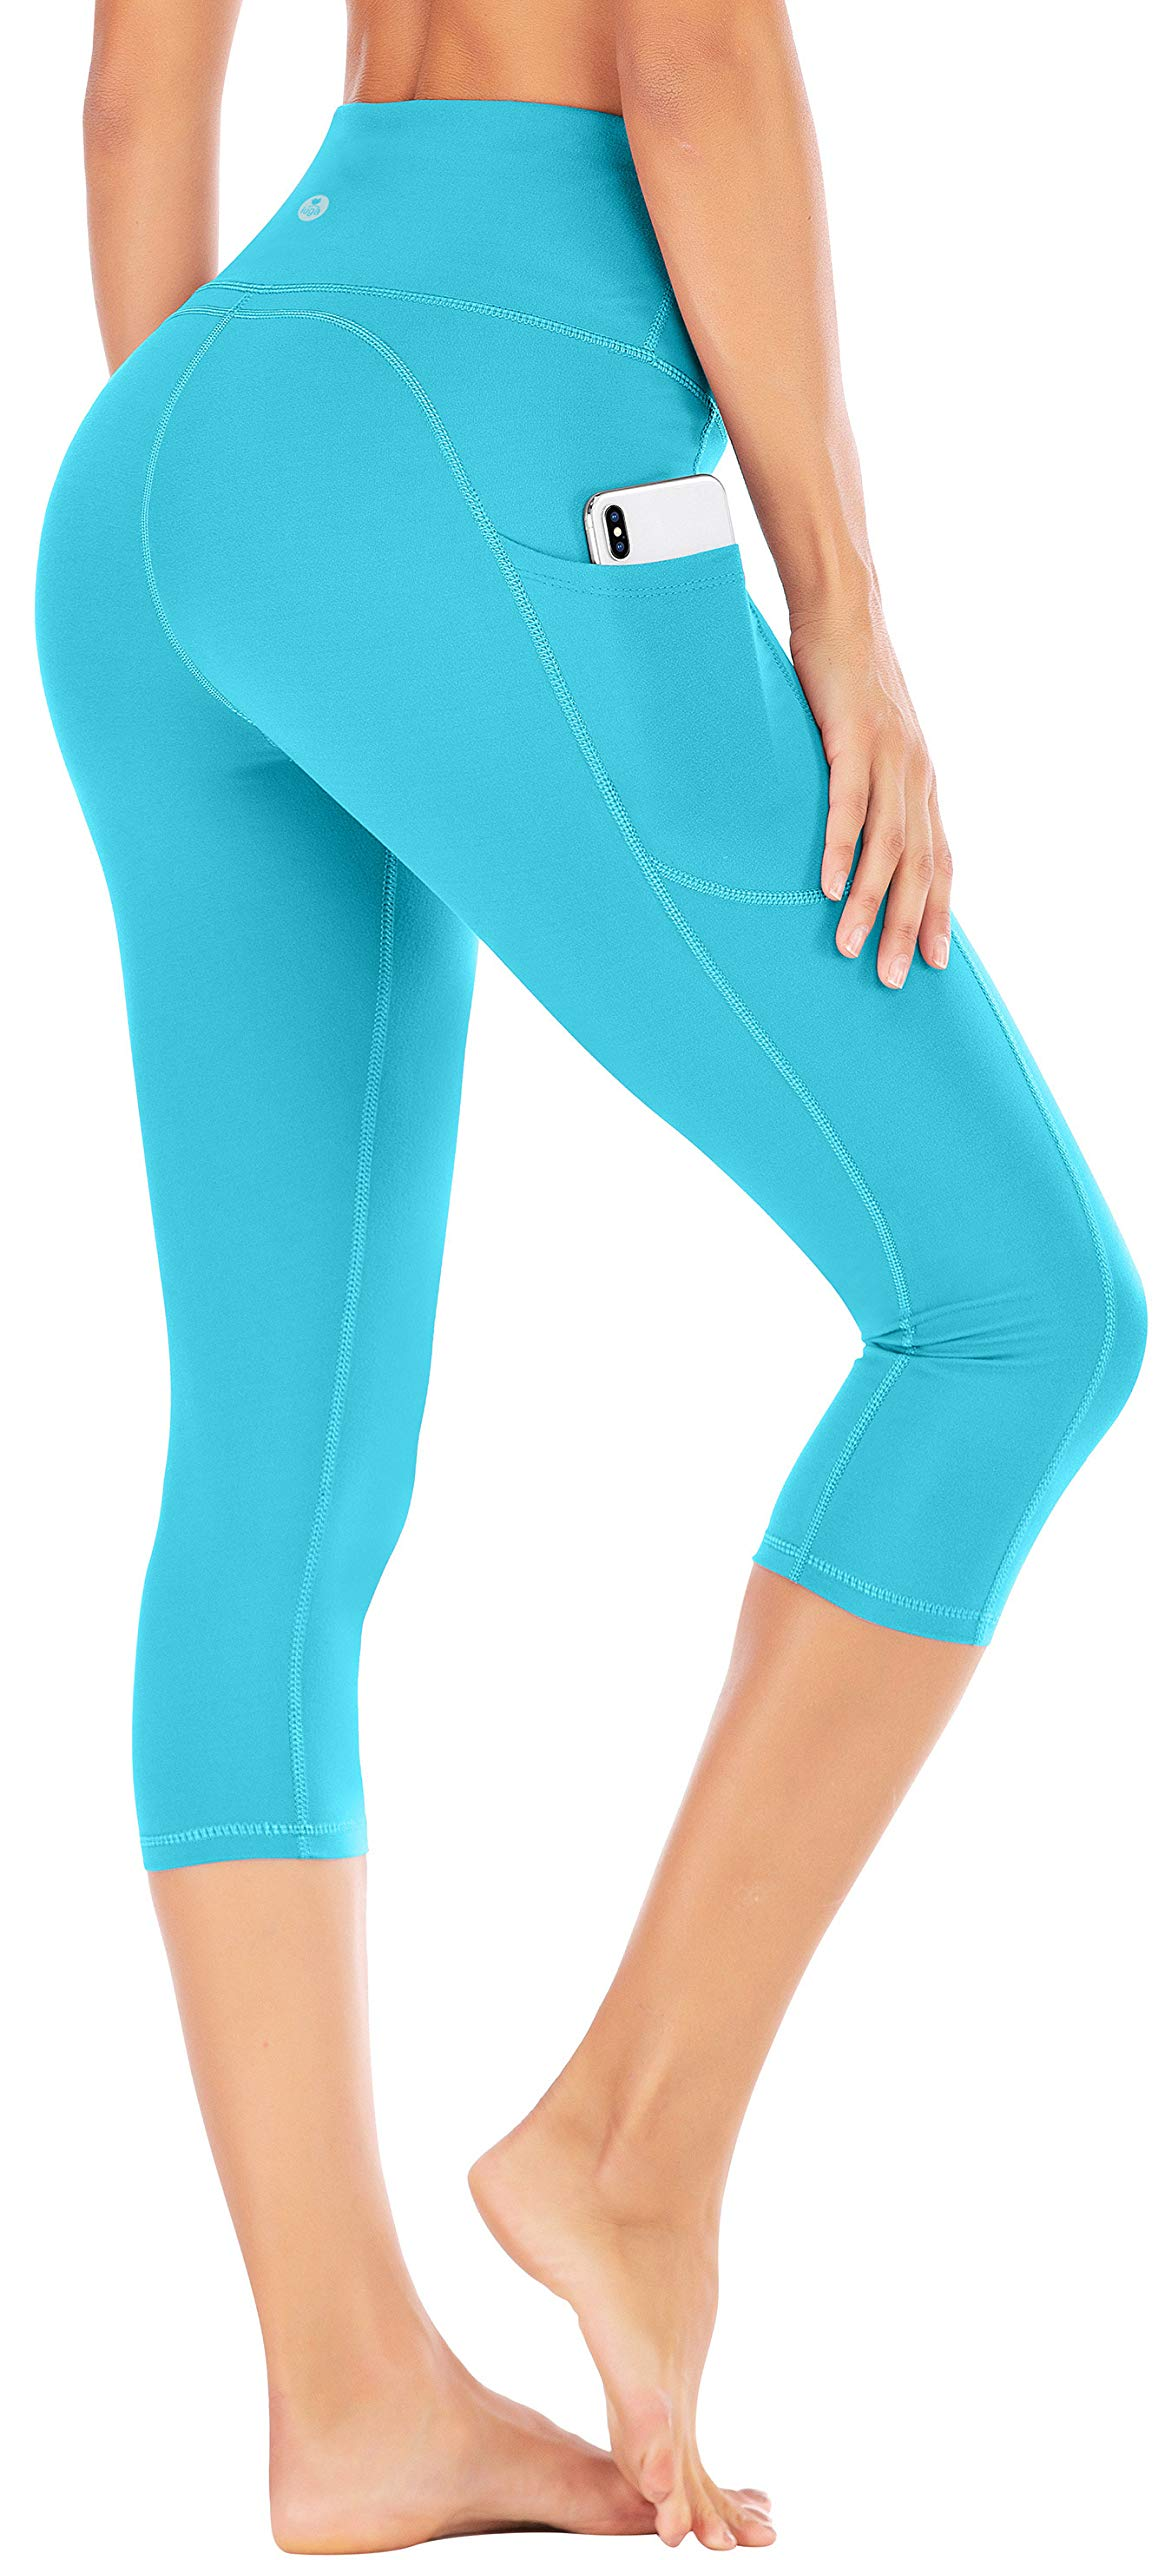 IUGA High Waist Yoga Pants with Pockets, Tummy Control Yoga Capris for Women, 4 Way Stretch Capri Leggings with Pockets(Light Blue, M) by IUGA